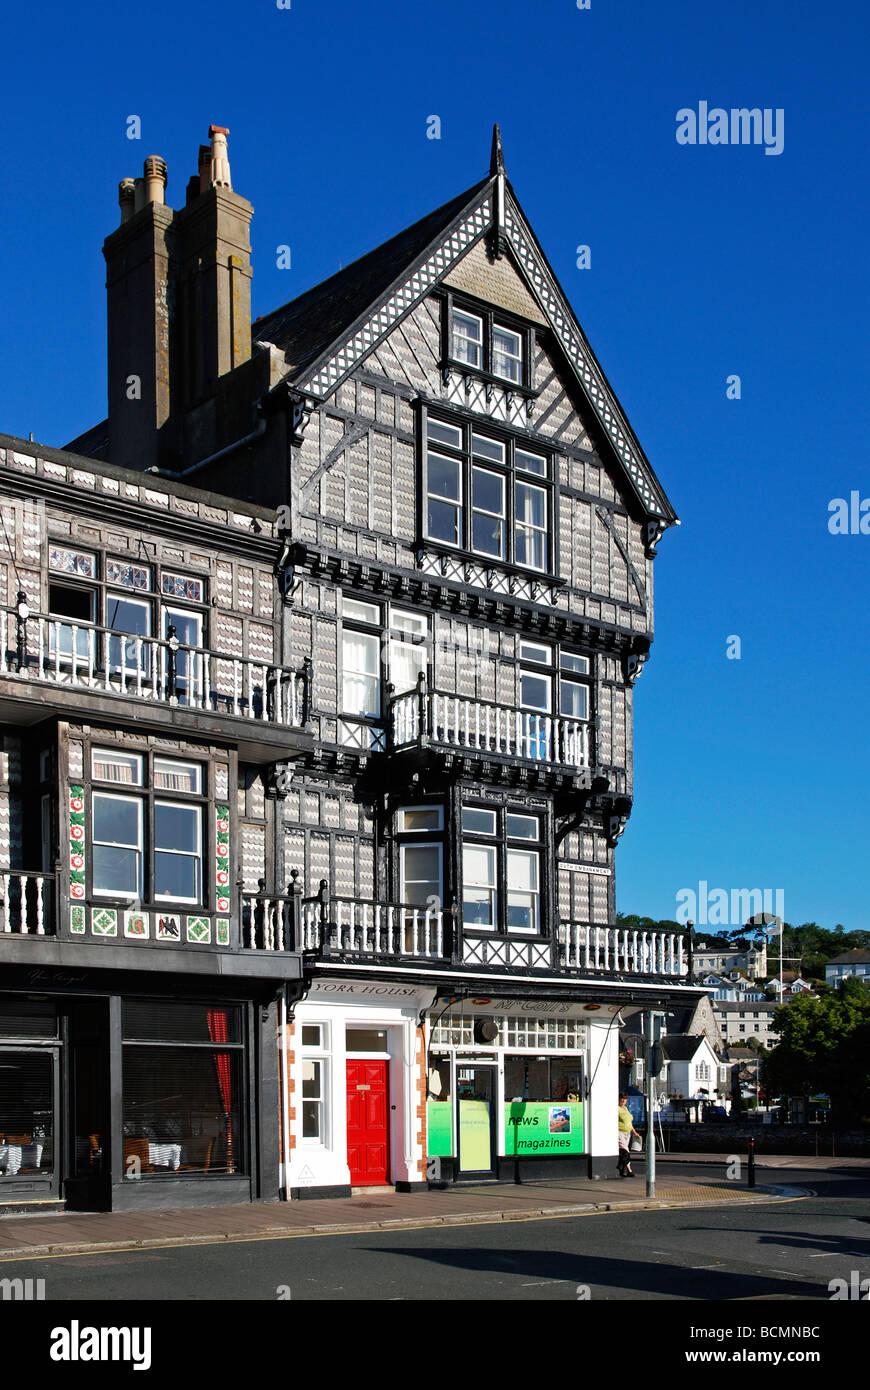 La arquitectura de estilo tudor, Dartmouth, Devon, Reino Unido Imagen De Stock